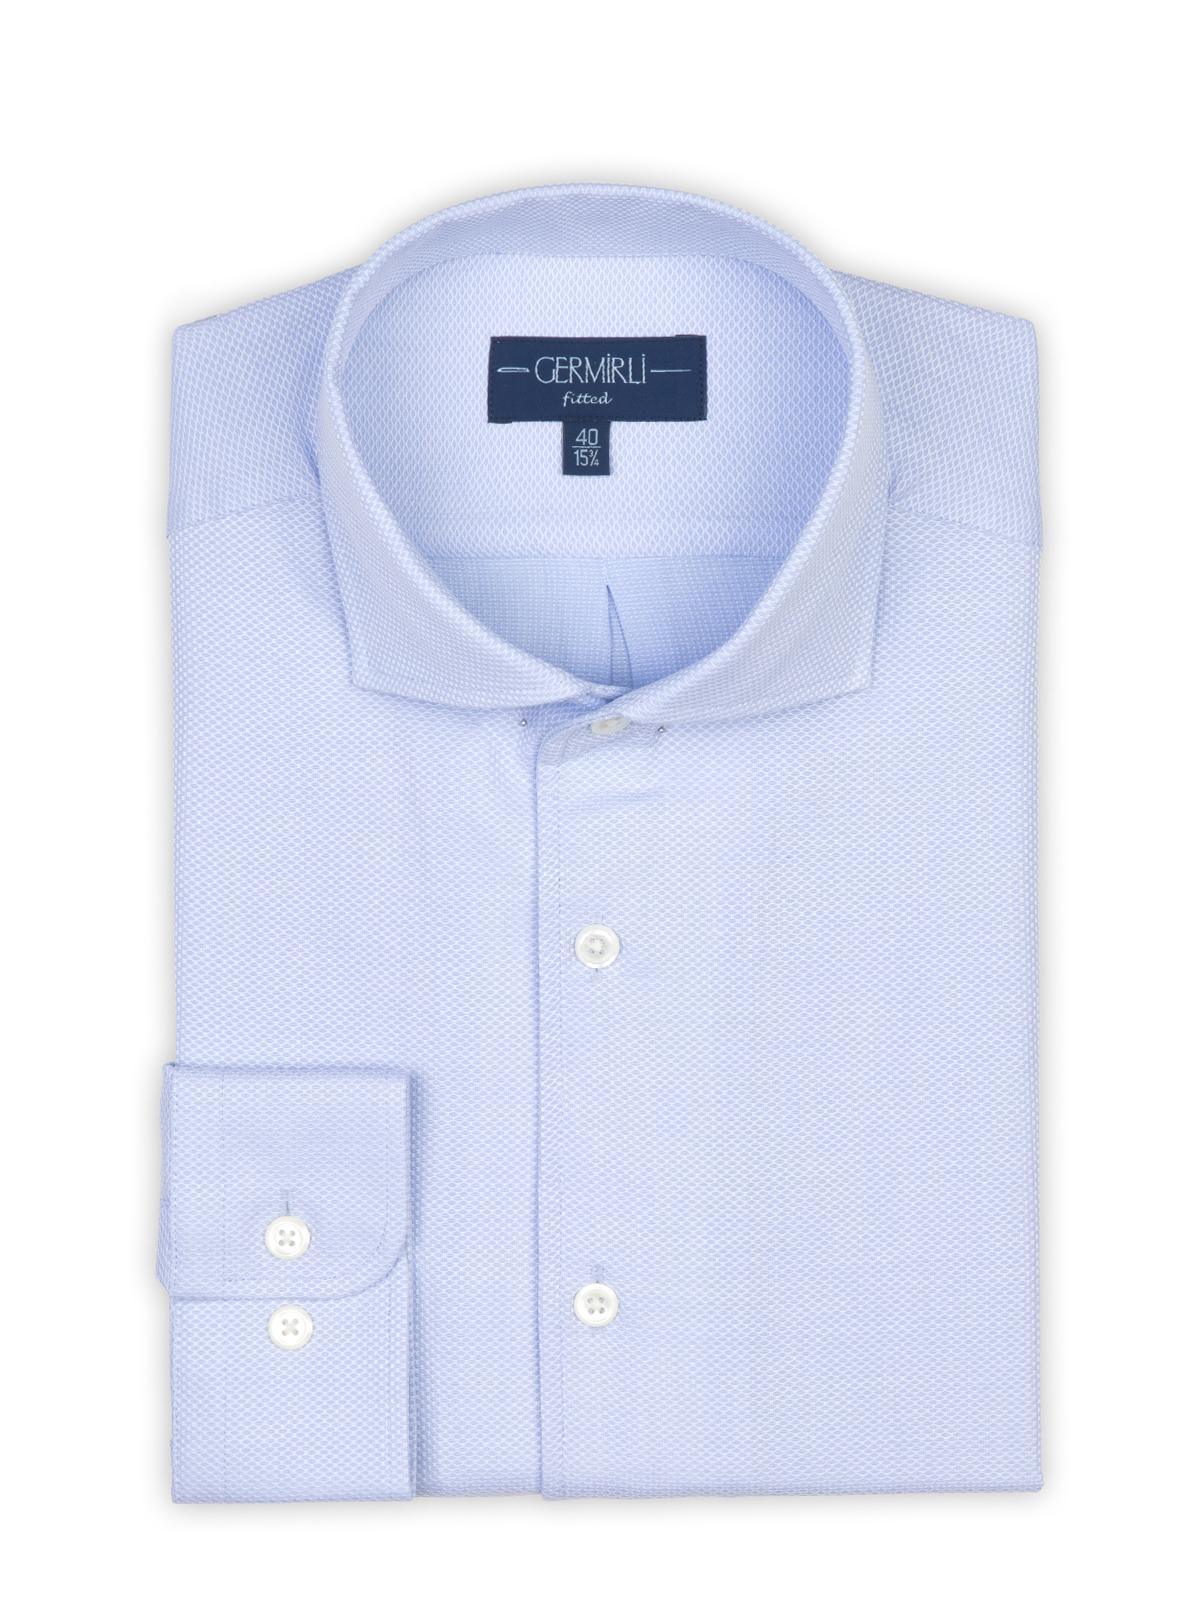 Germirli A.Mavi Petek Dokulu Nevapas Tek Parça Yaka Tailor Fit Gömlek